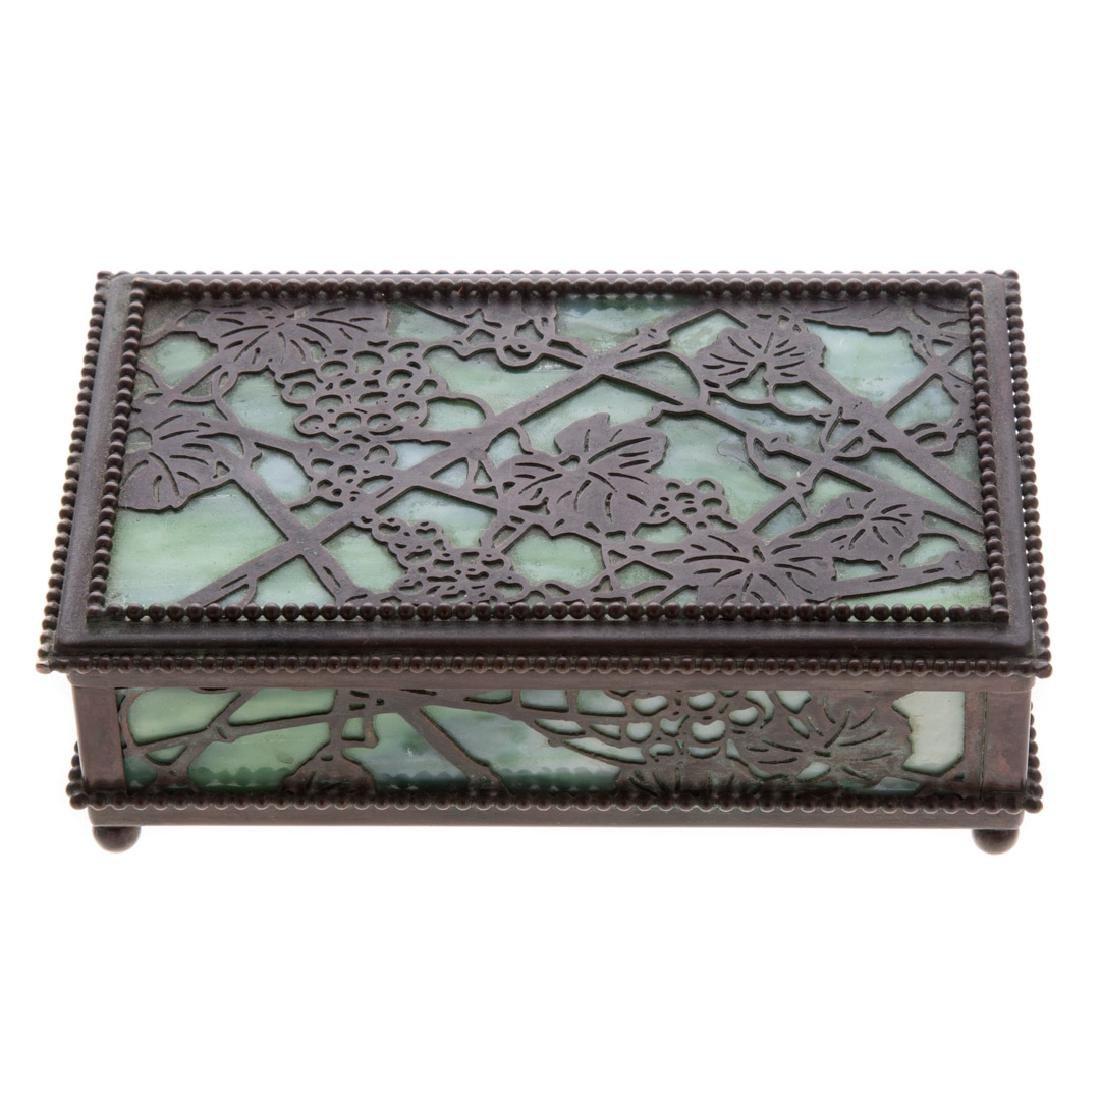 American Art Nouveau bronze/glass desk box